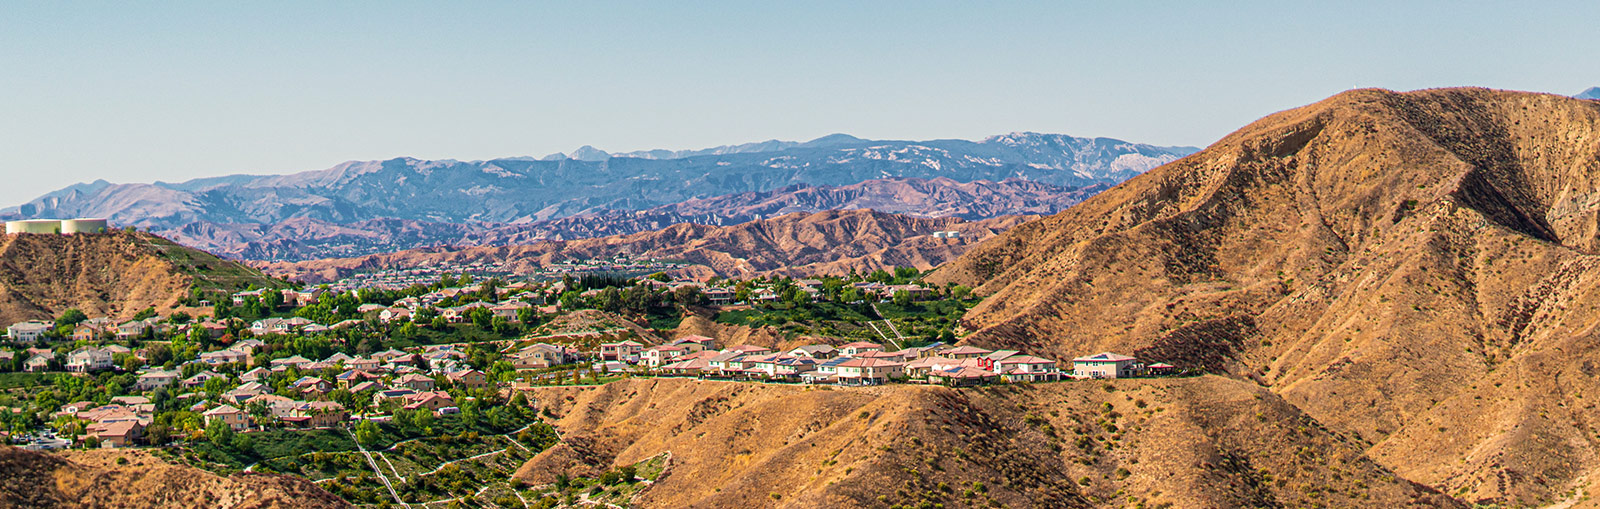 Community_Clinic-Ventura_Santa_Clarita